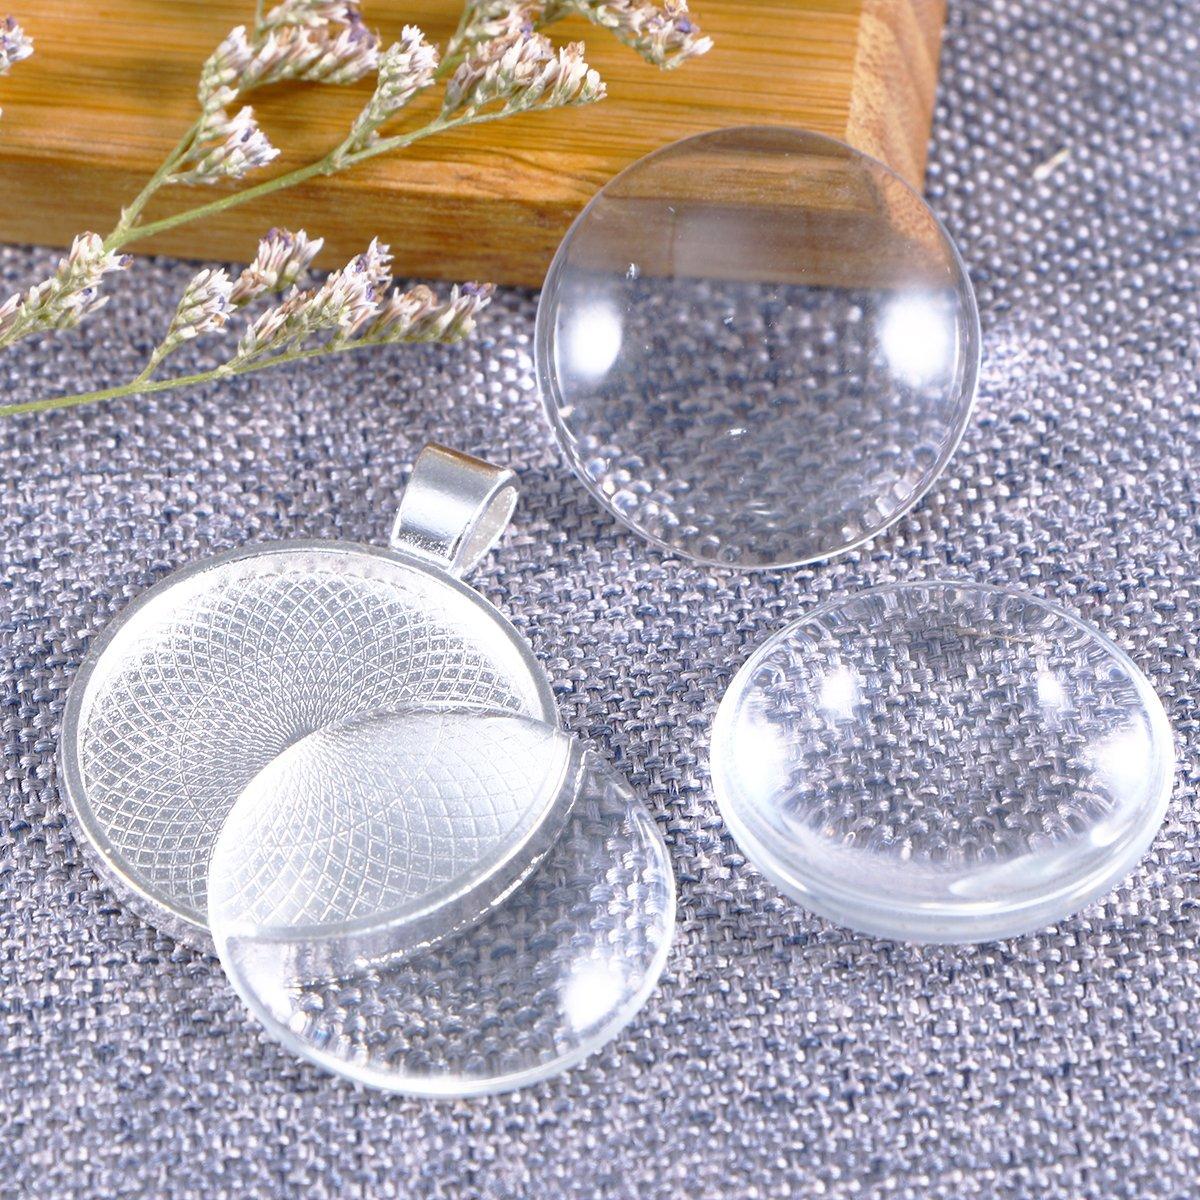 ARTLILY 20 Set Bezel Pendant Trays Glass Cabochon Pendant Blanks with Glass Cabochon Dome Tiles Bezel Cabochon Settings Silver